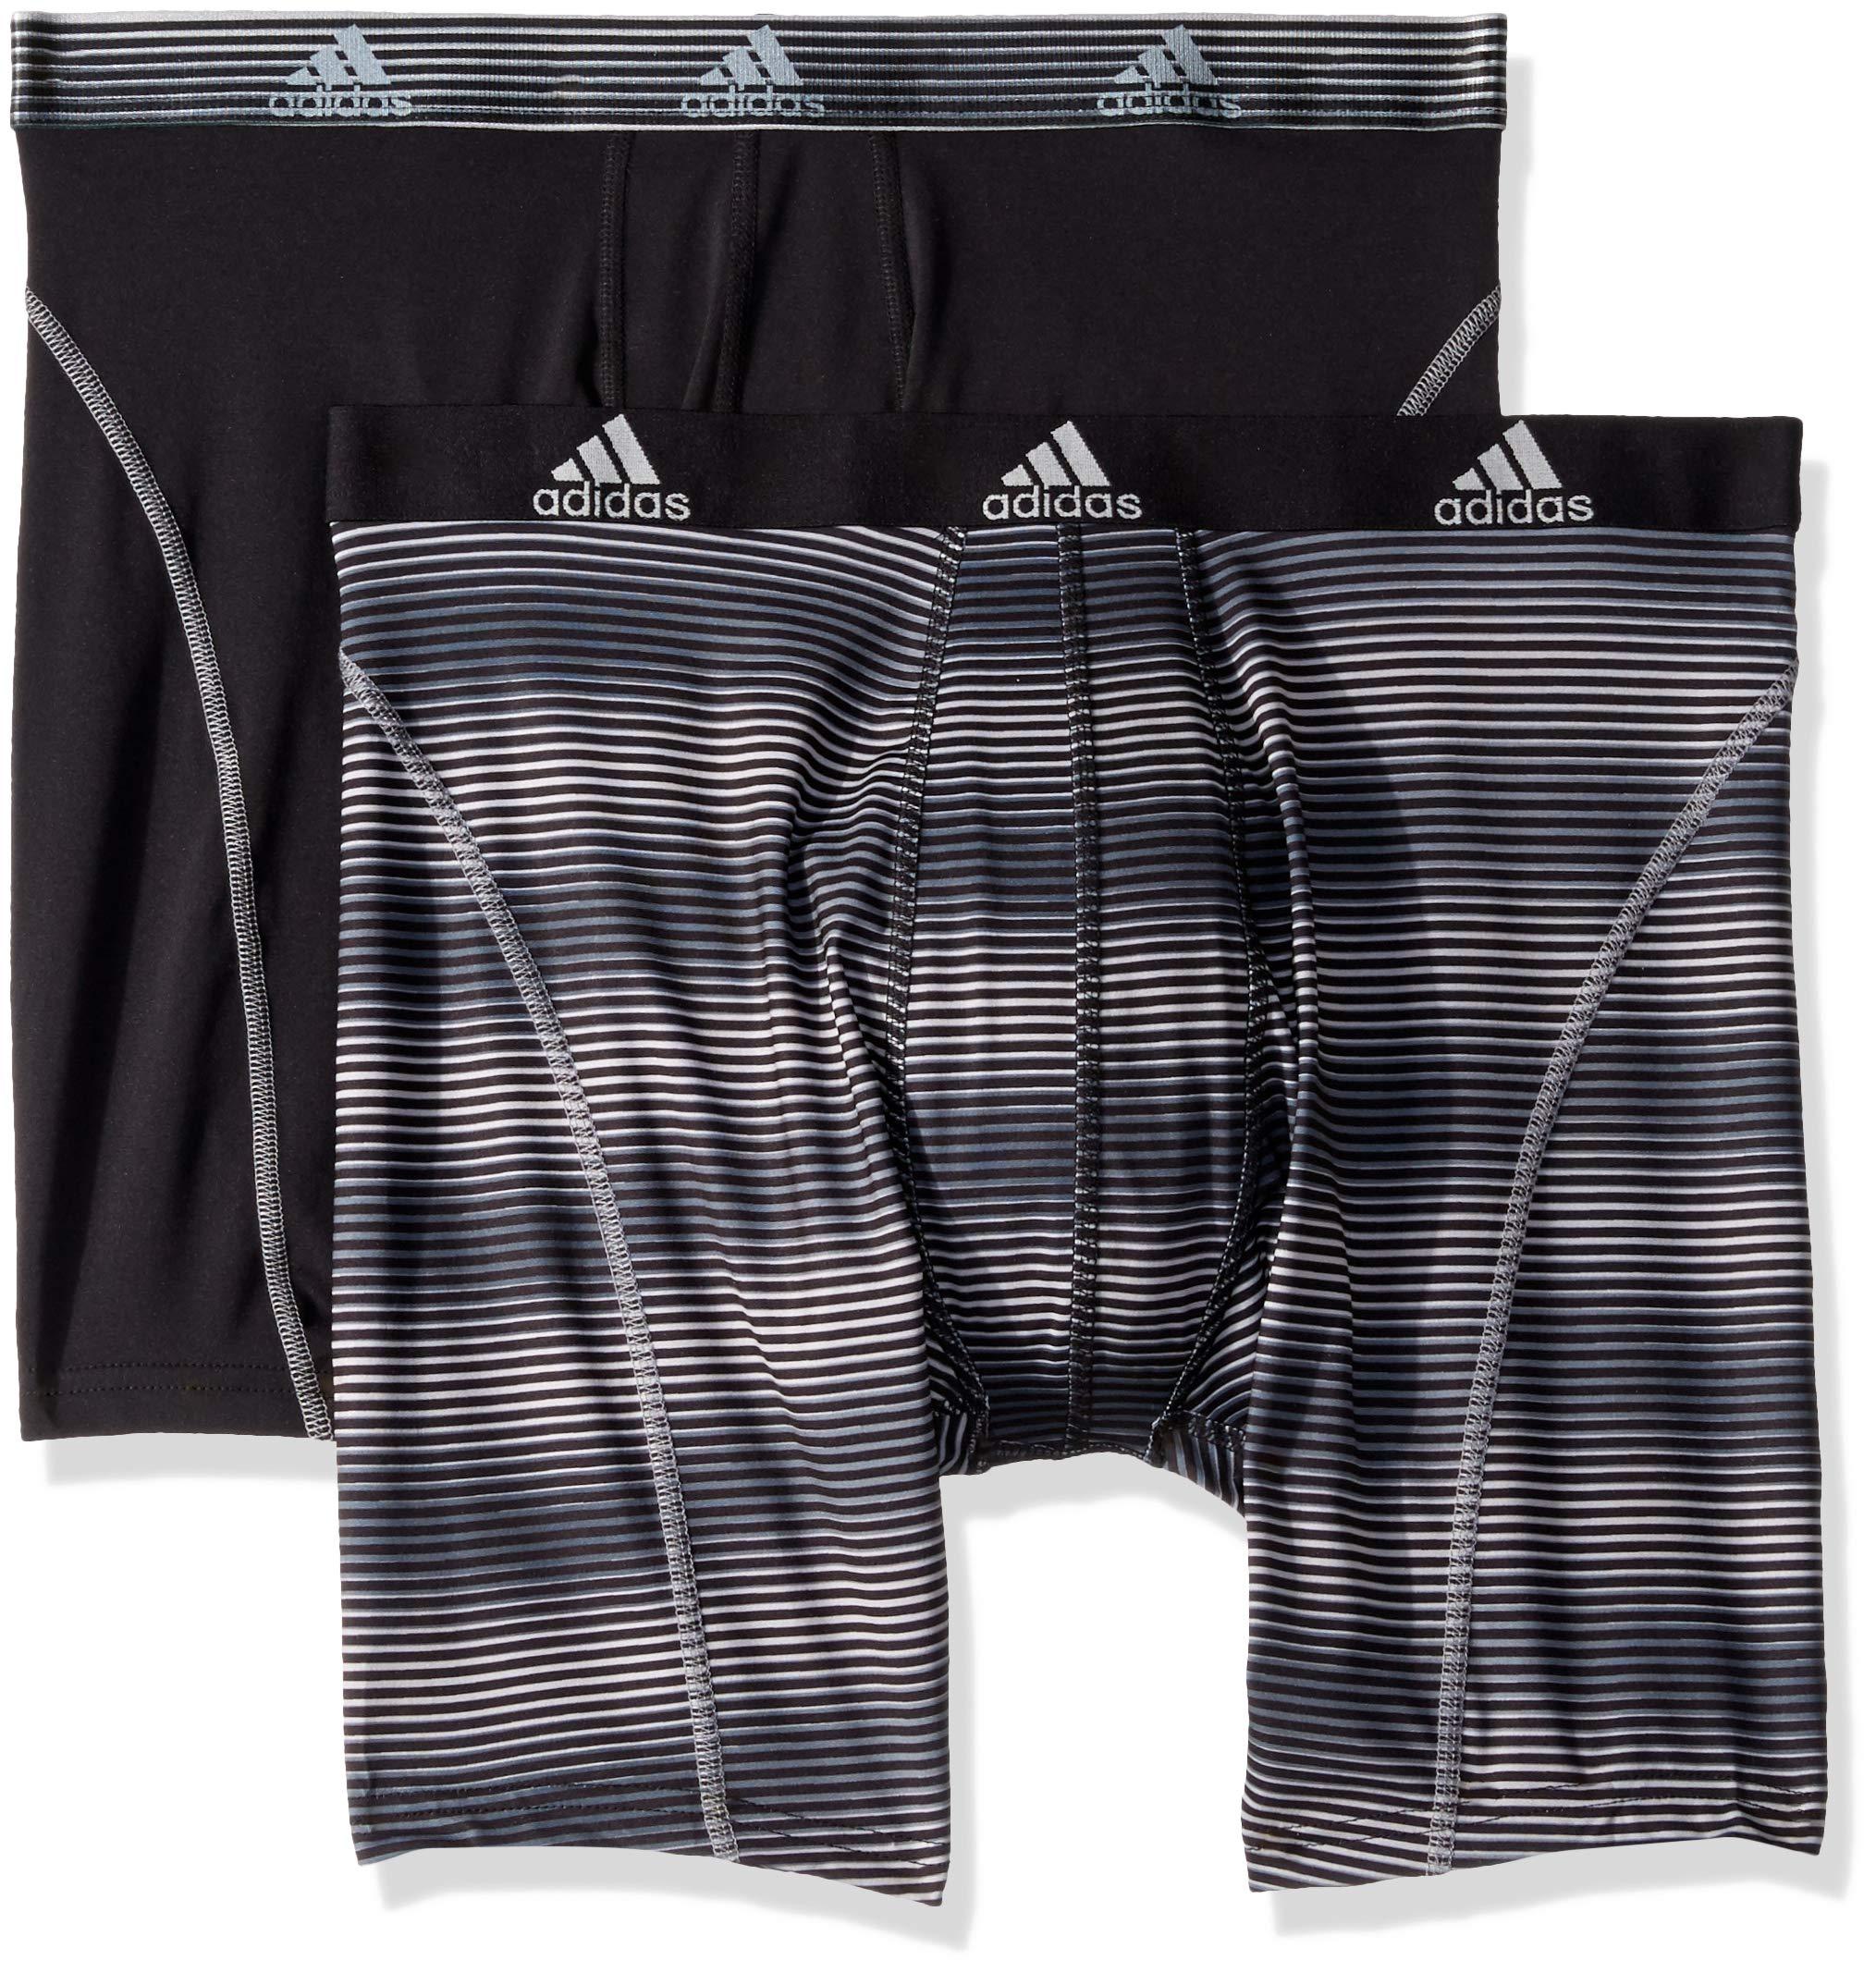 adidas Men's Sport Performance Midway Underwear (2-Pack), Sundown Black Black/Grey, SMALL by adidas